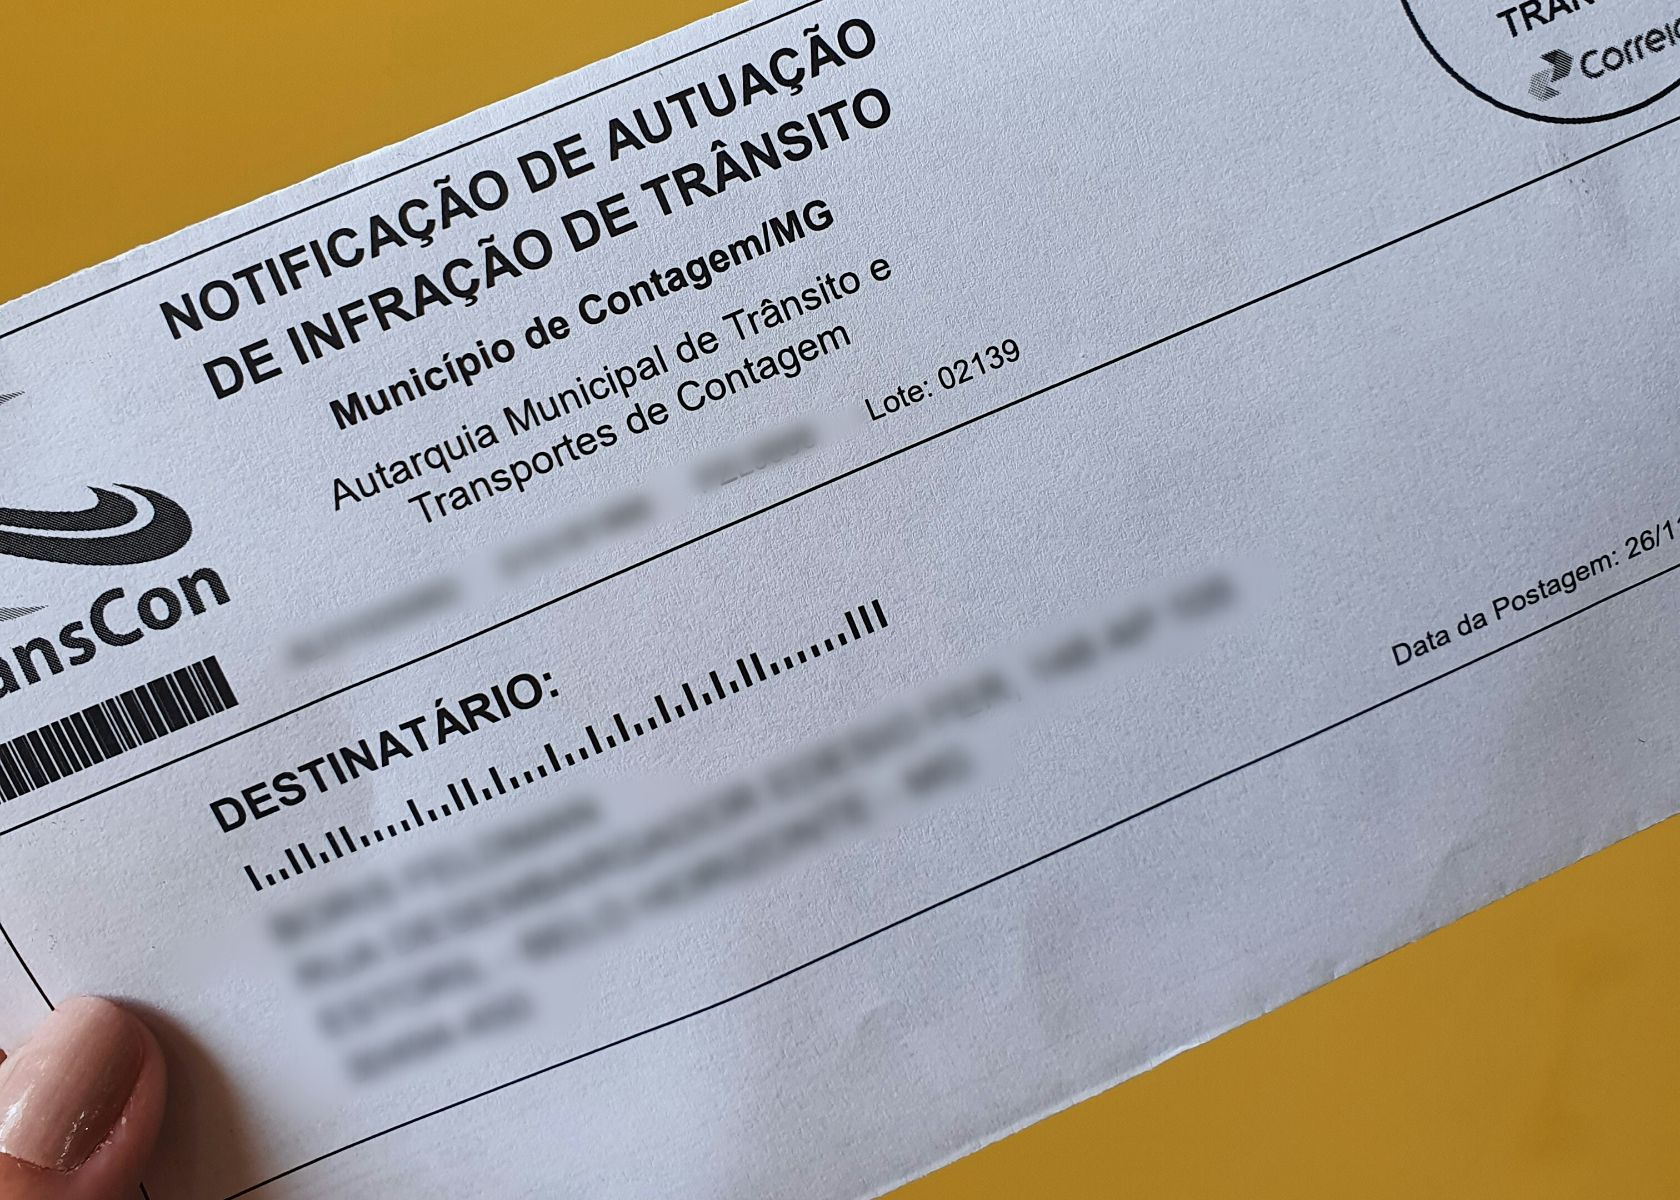 mulher segurando notificacao de autuacao de infracao de transito emitida pela transcon